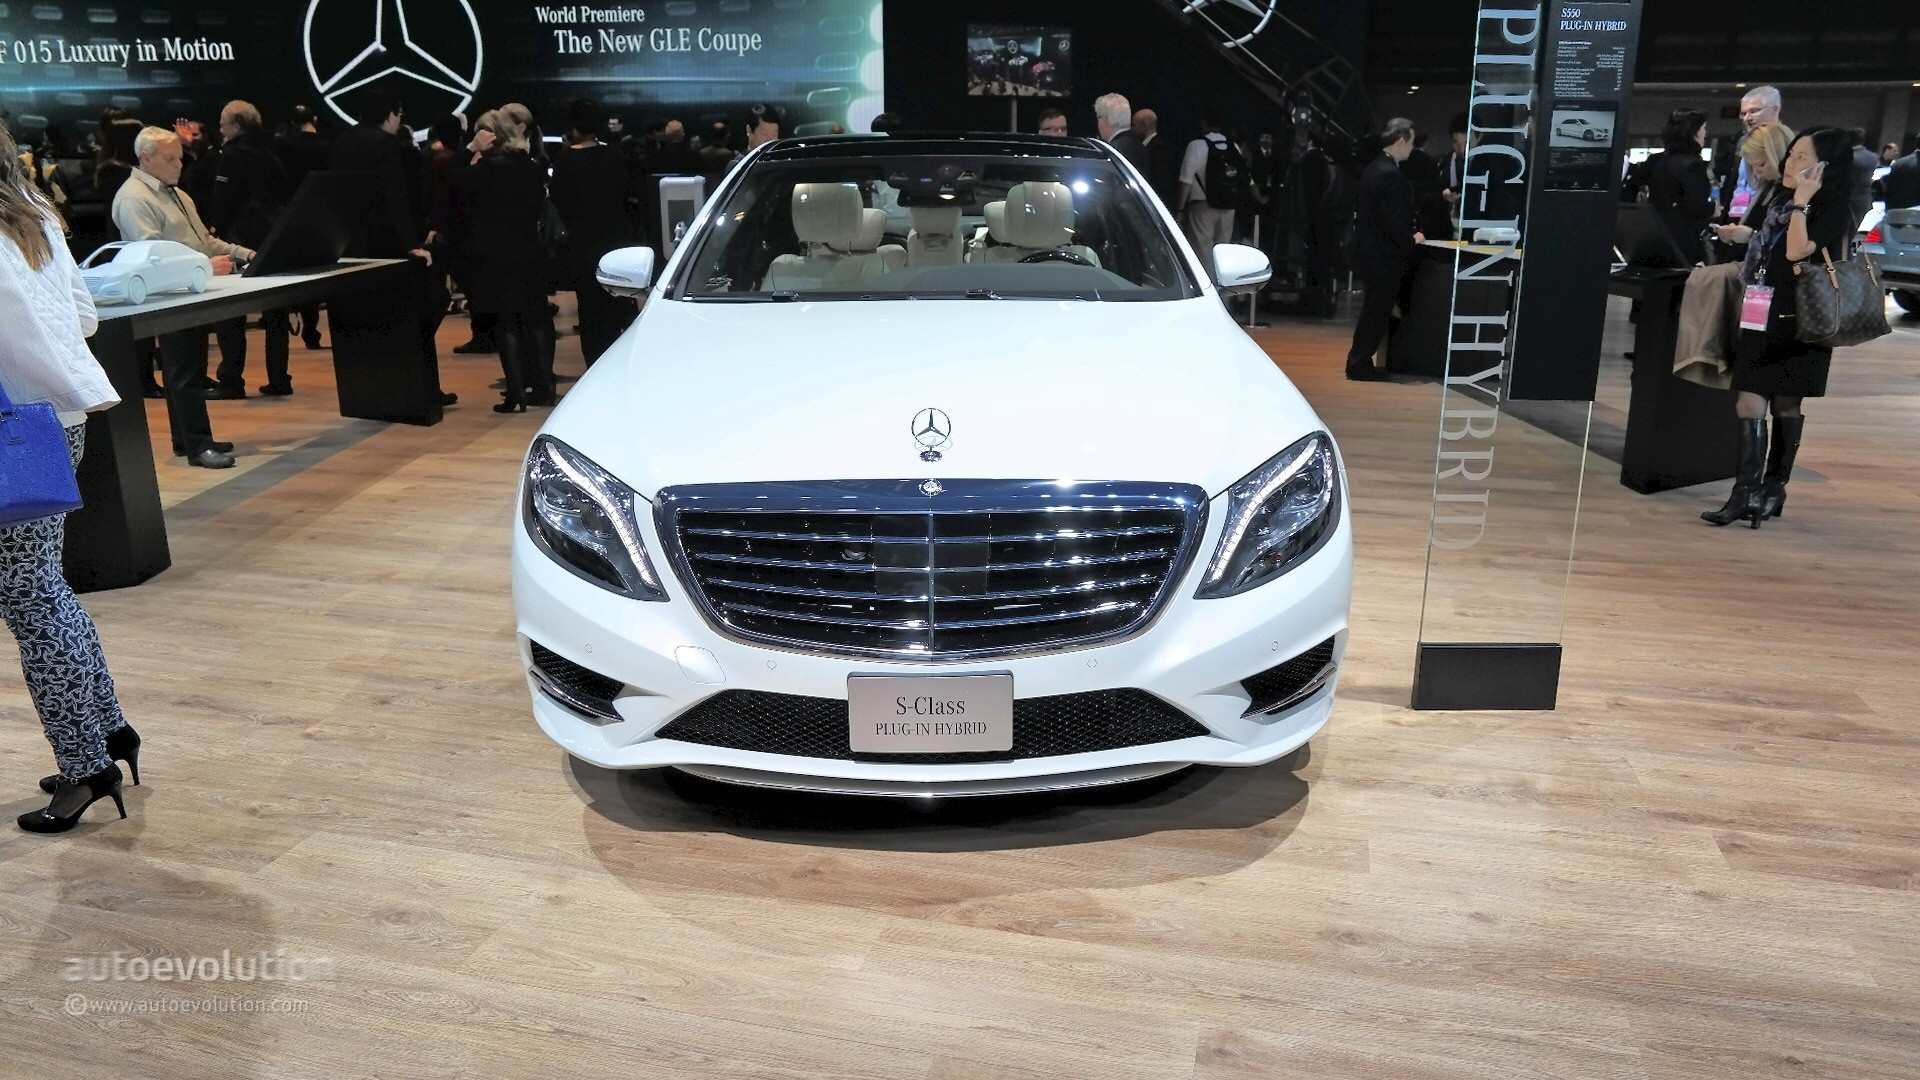 Rapper T.I. Shells Out $225K on Custom Mercedes-Benz S Cabriolet for ...